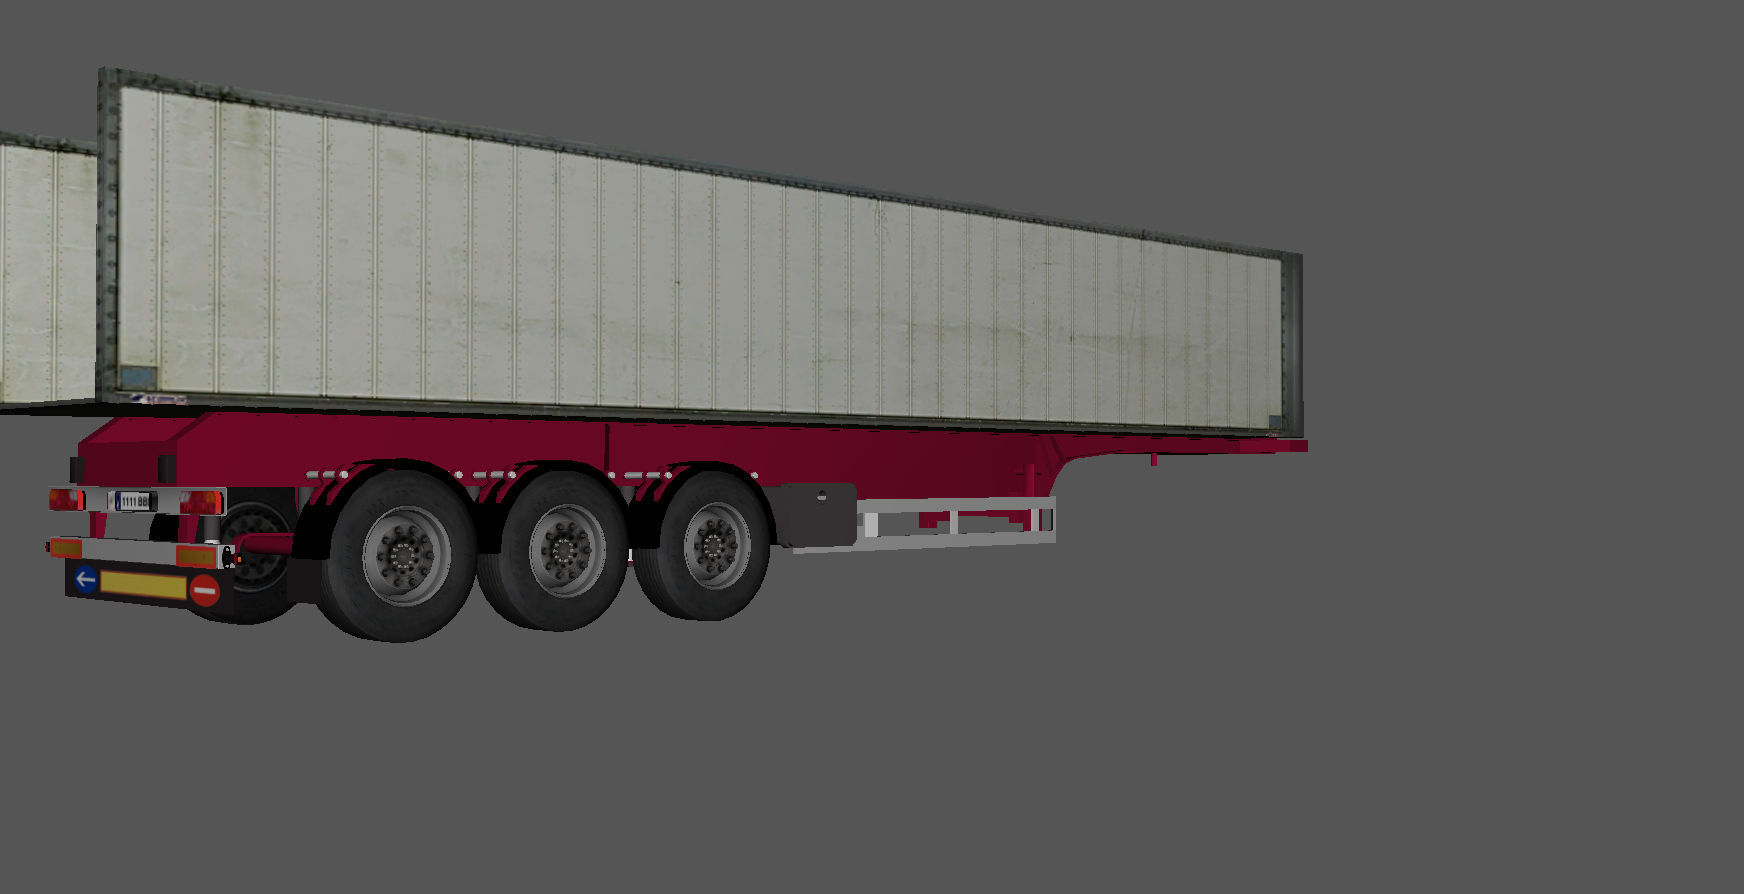 [T.E.P.] Semitrailer  2byu6s